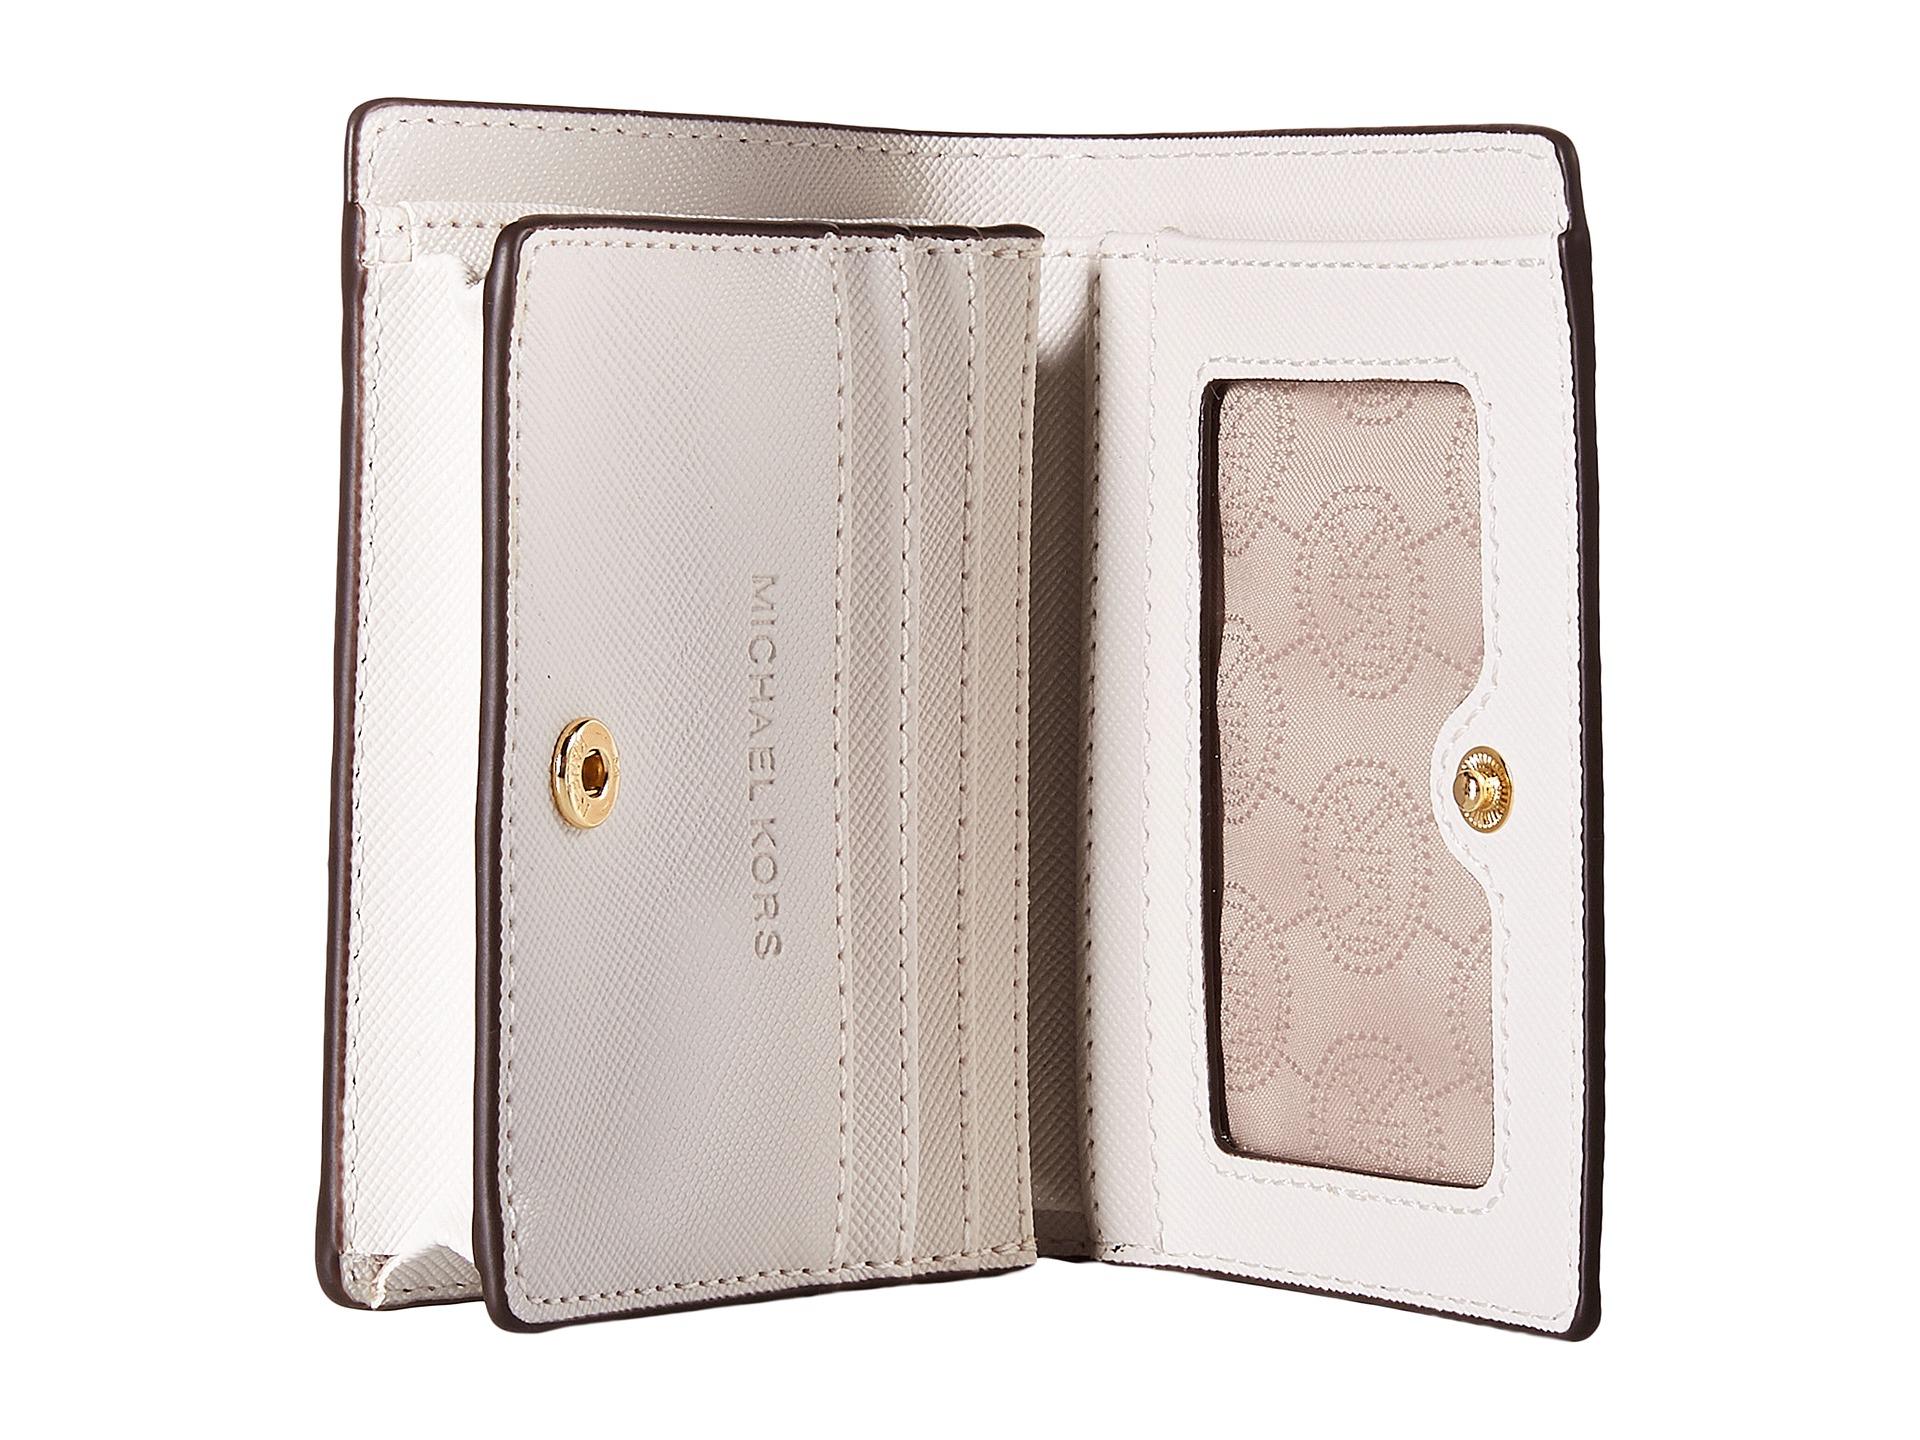 646b1636f849 MICHAEL Michael Kors Jet Set Travel Flap Card Holder in White - Lyst